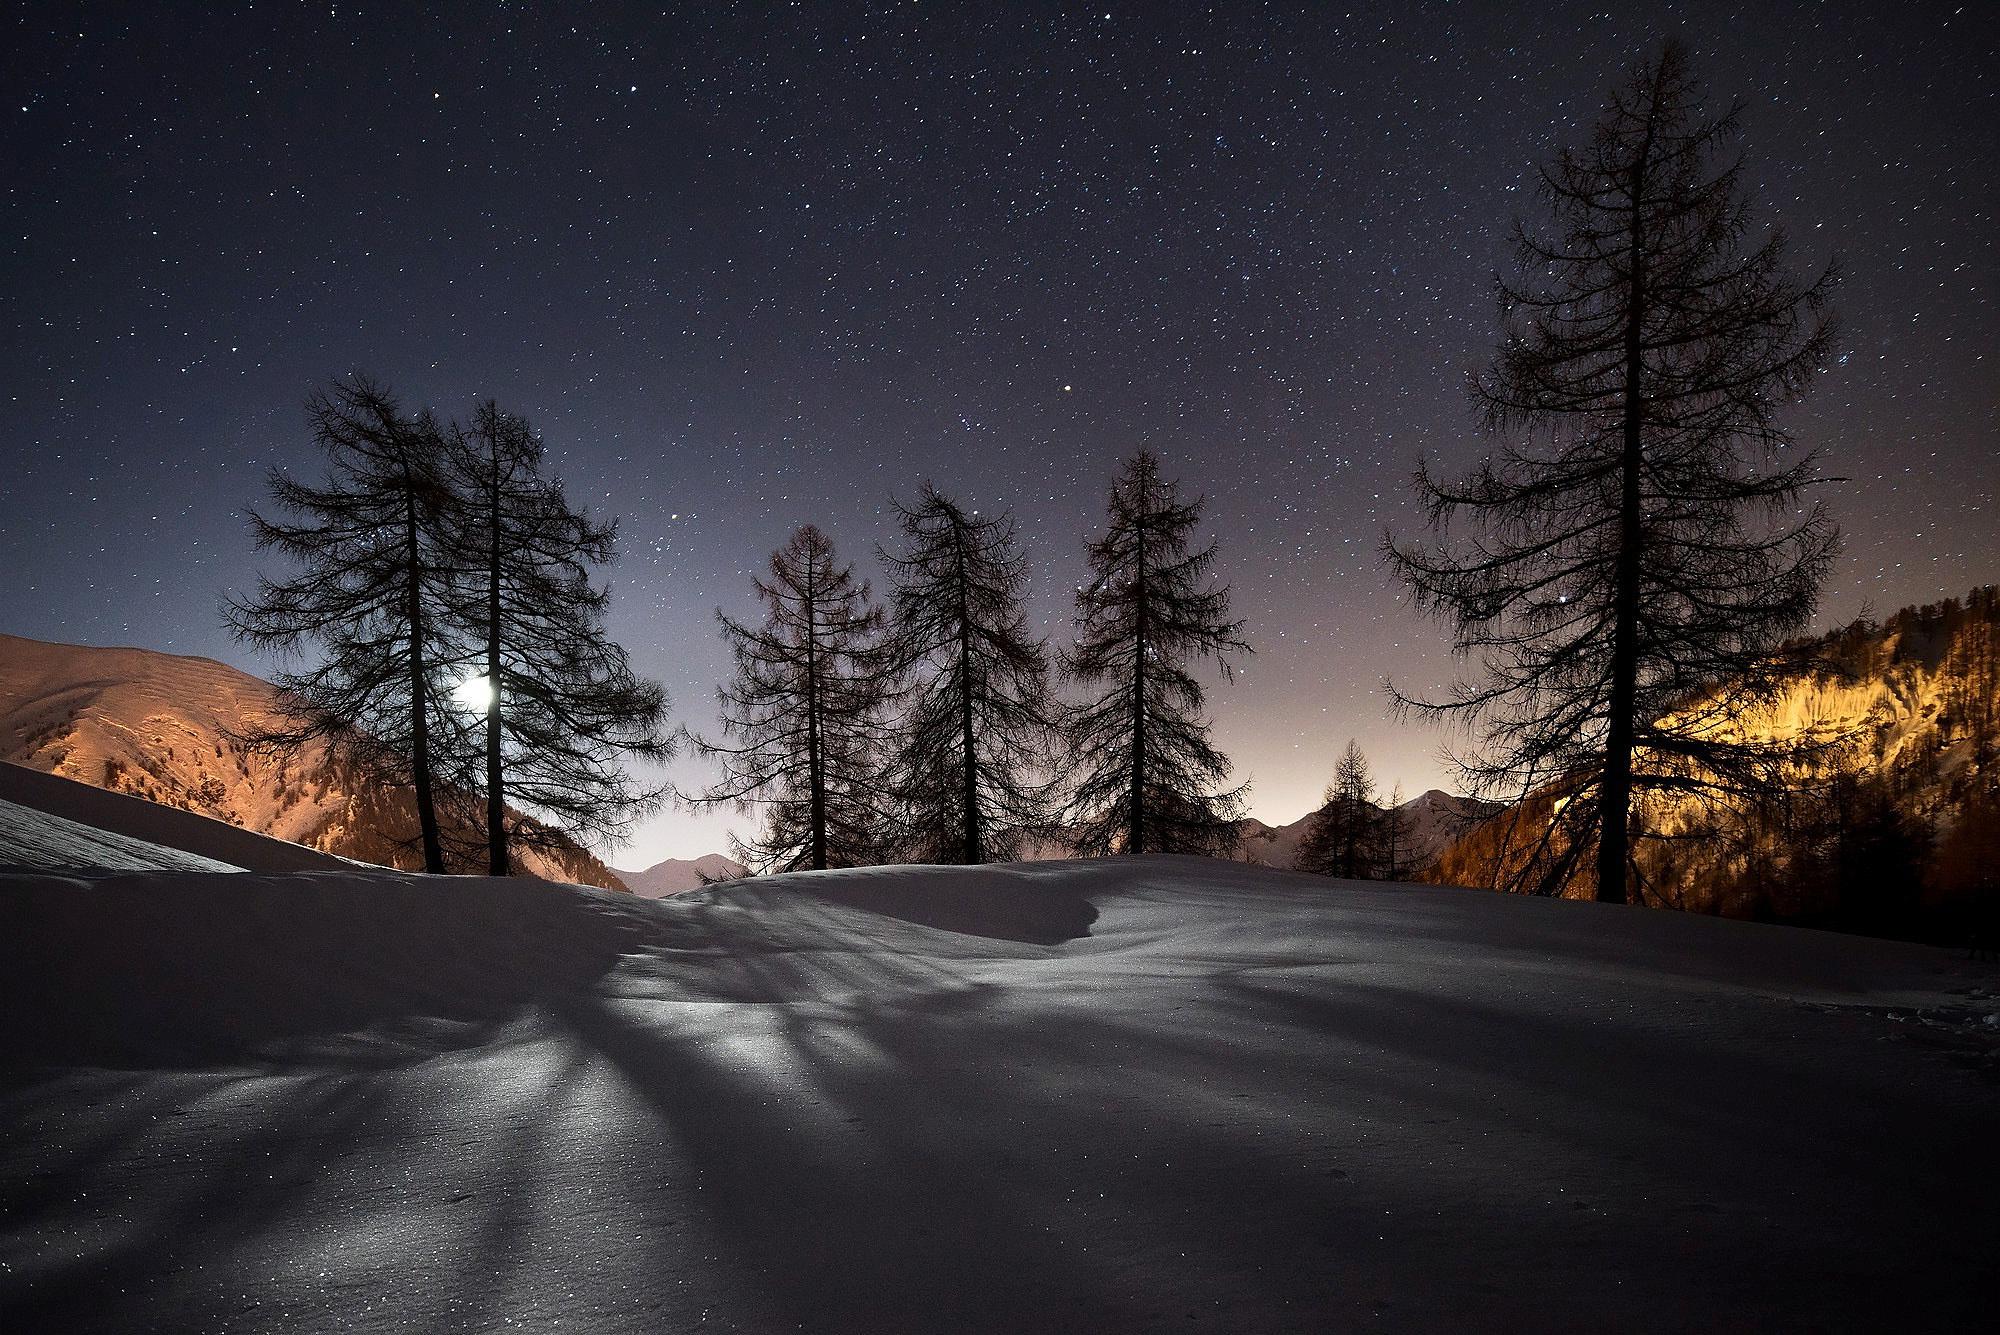 зима, снег, ночь, пейзаж, hd обои